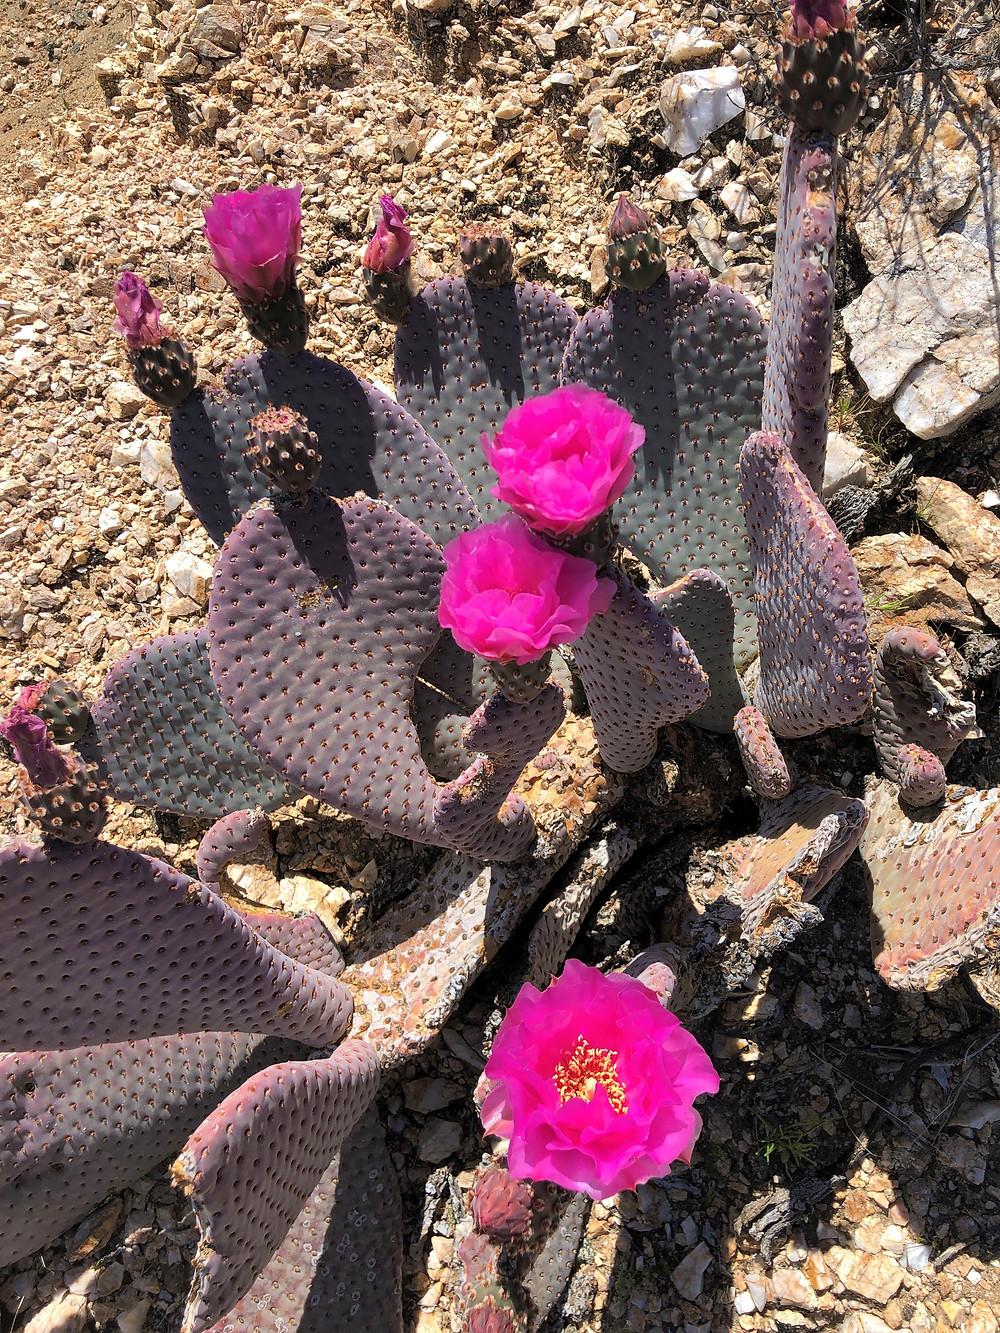 Bright fuchsia colored flowering Beaver Tail cactus